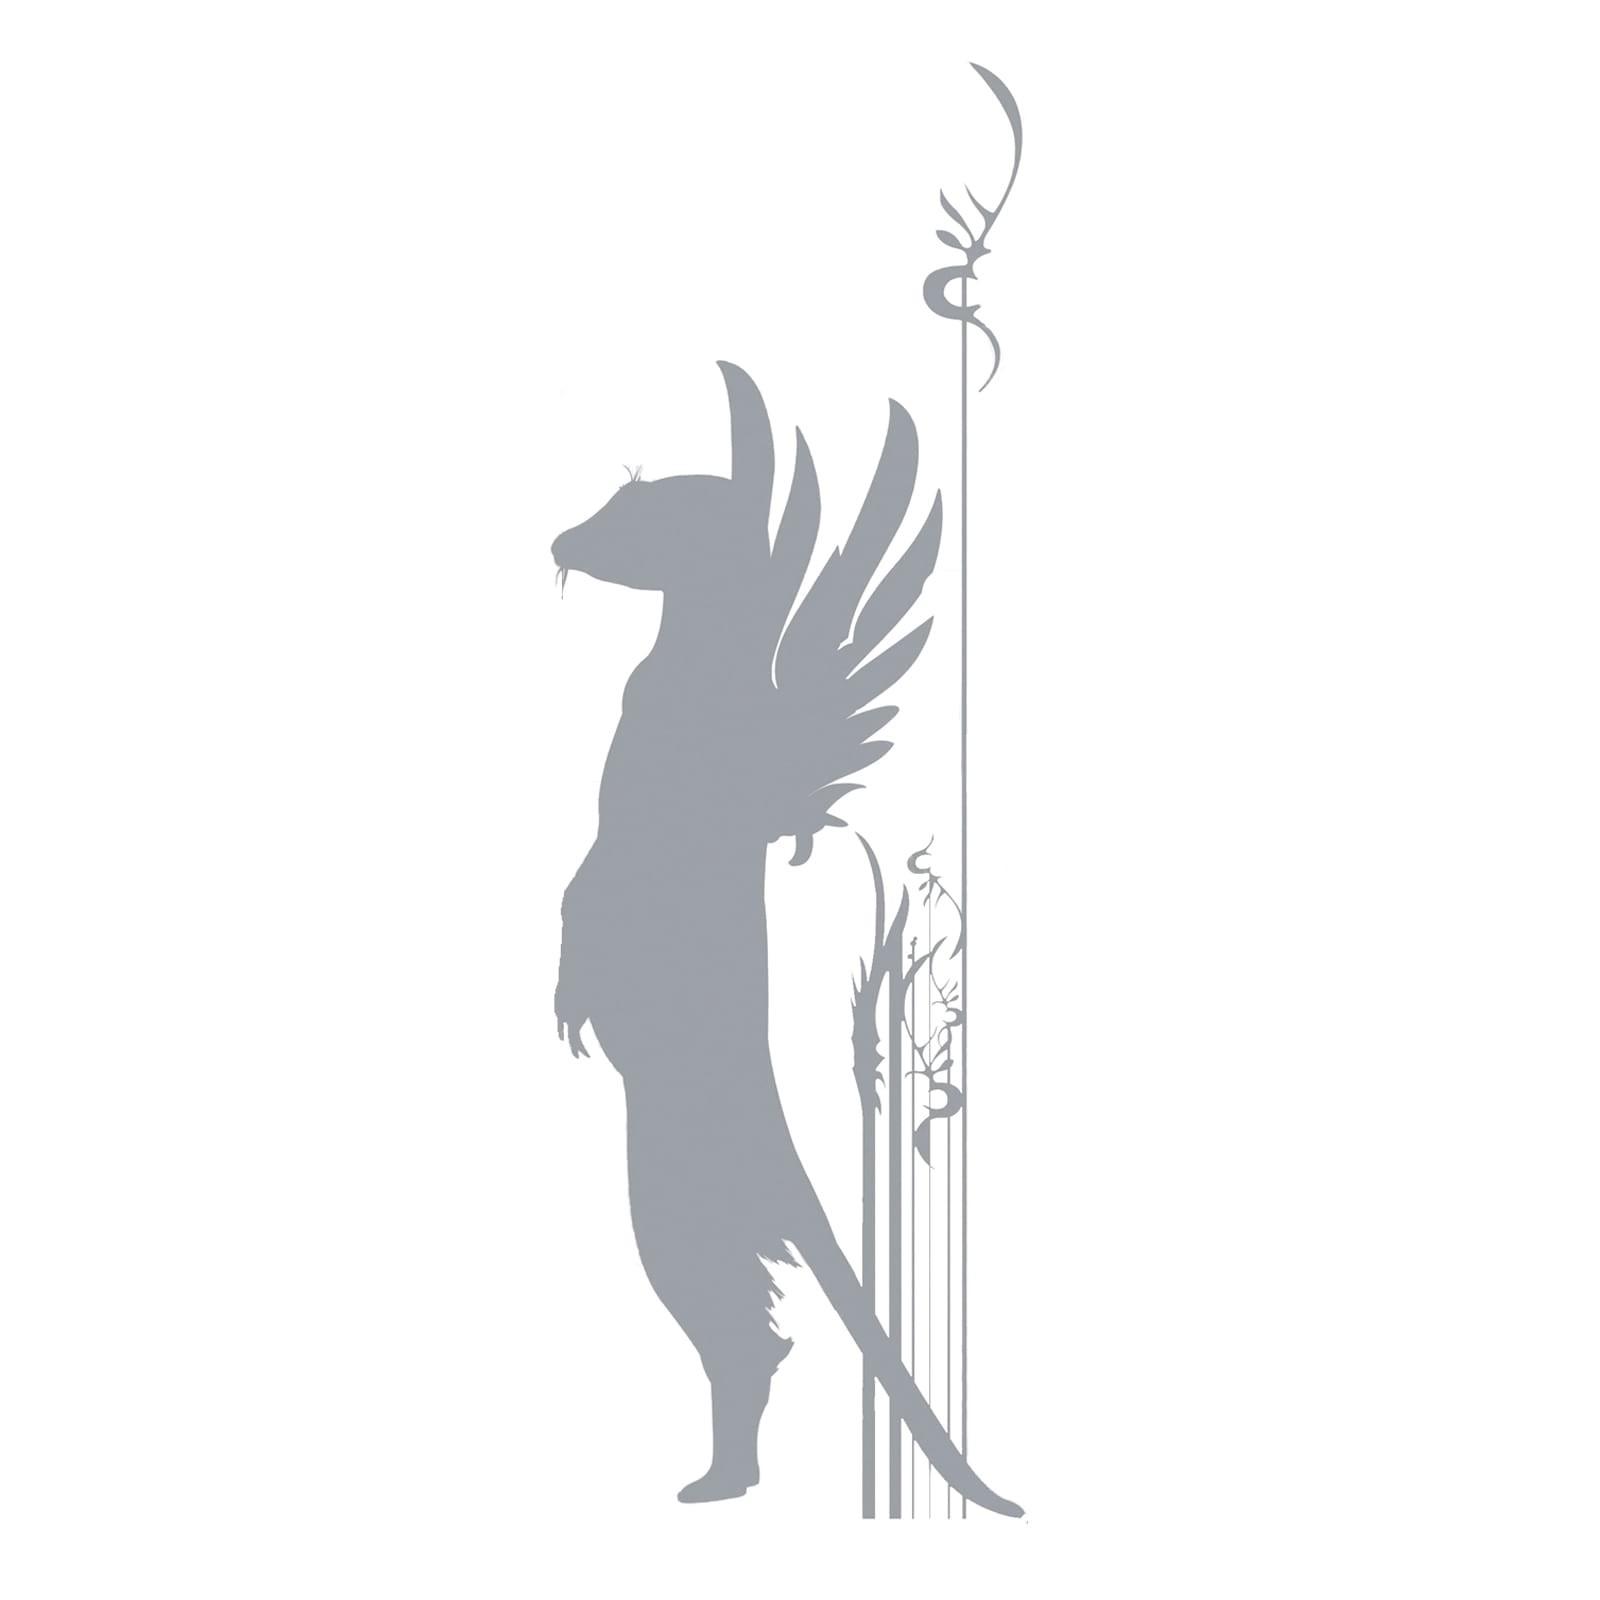 Aυτοκόλλητο Tοίχου Meerkat Angles (Αριστερό) - Domestic